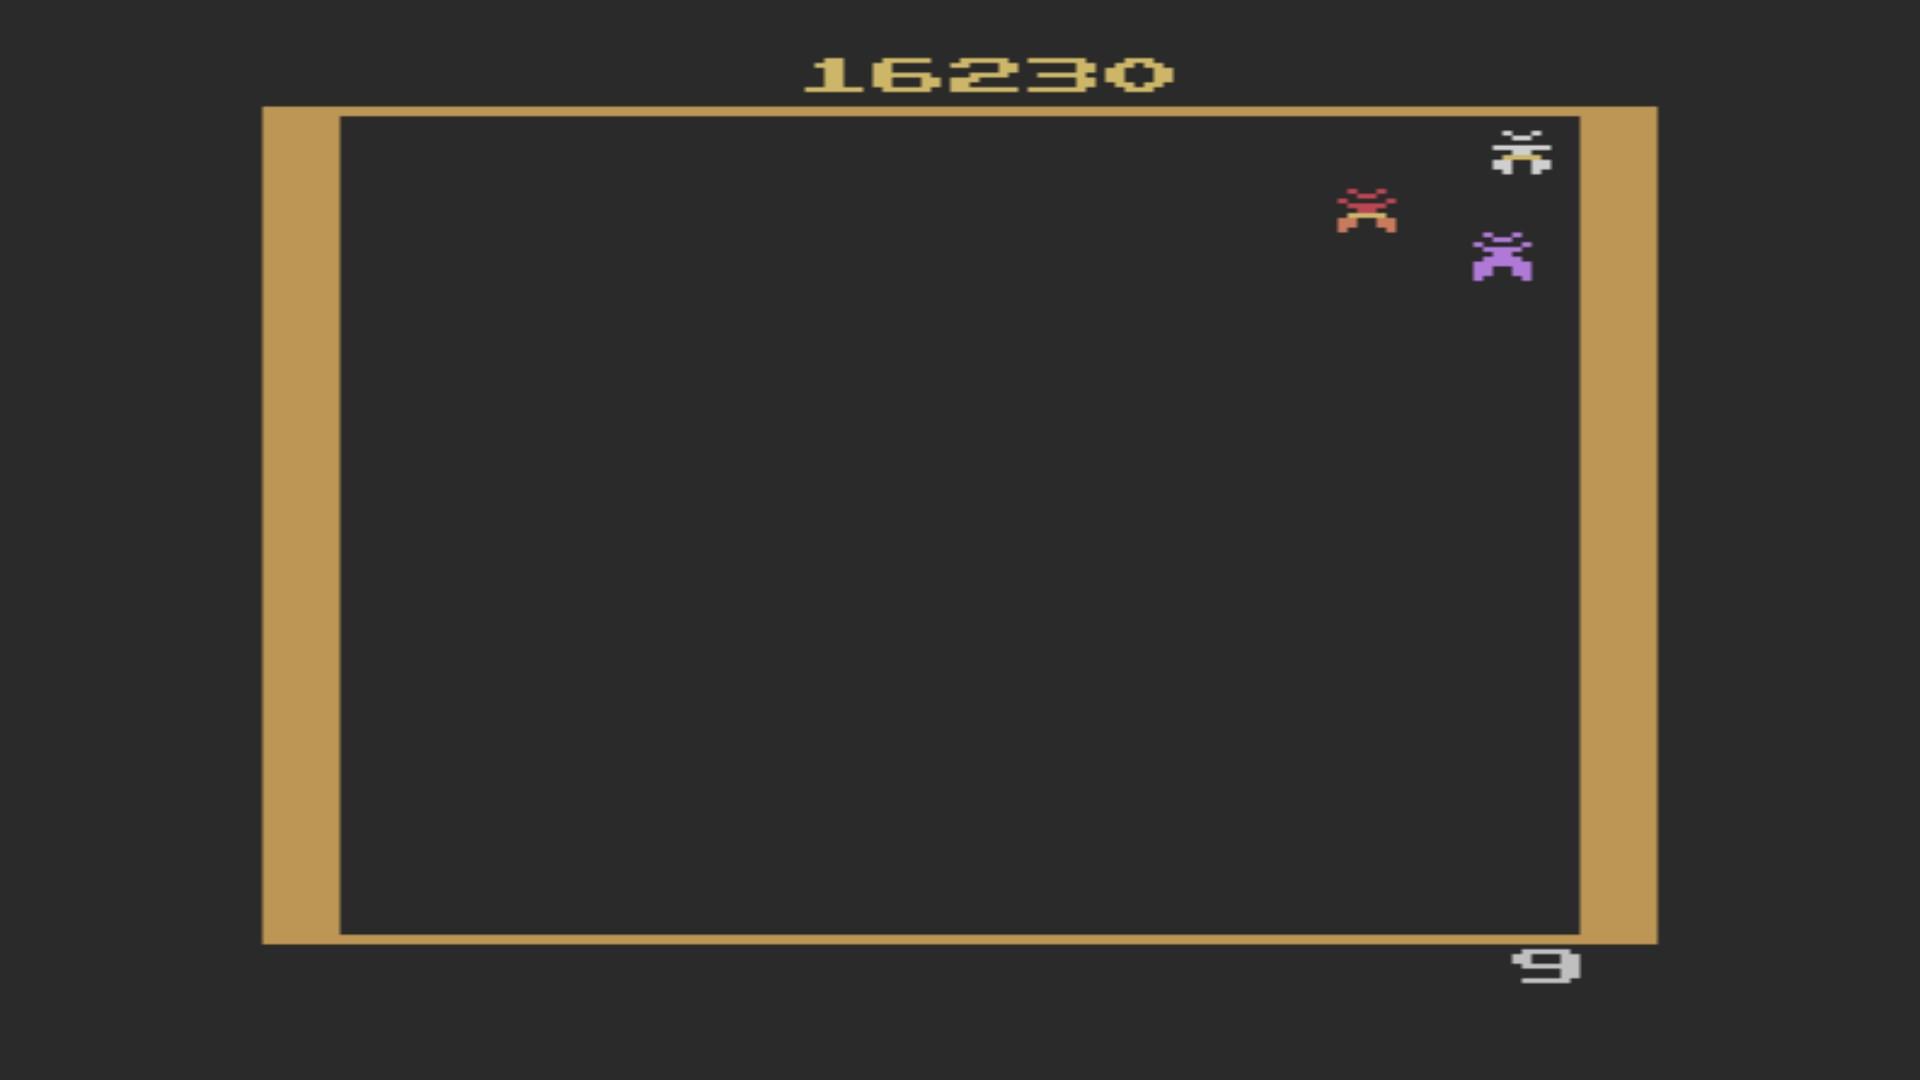 Galaxian 16,230 points